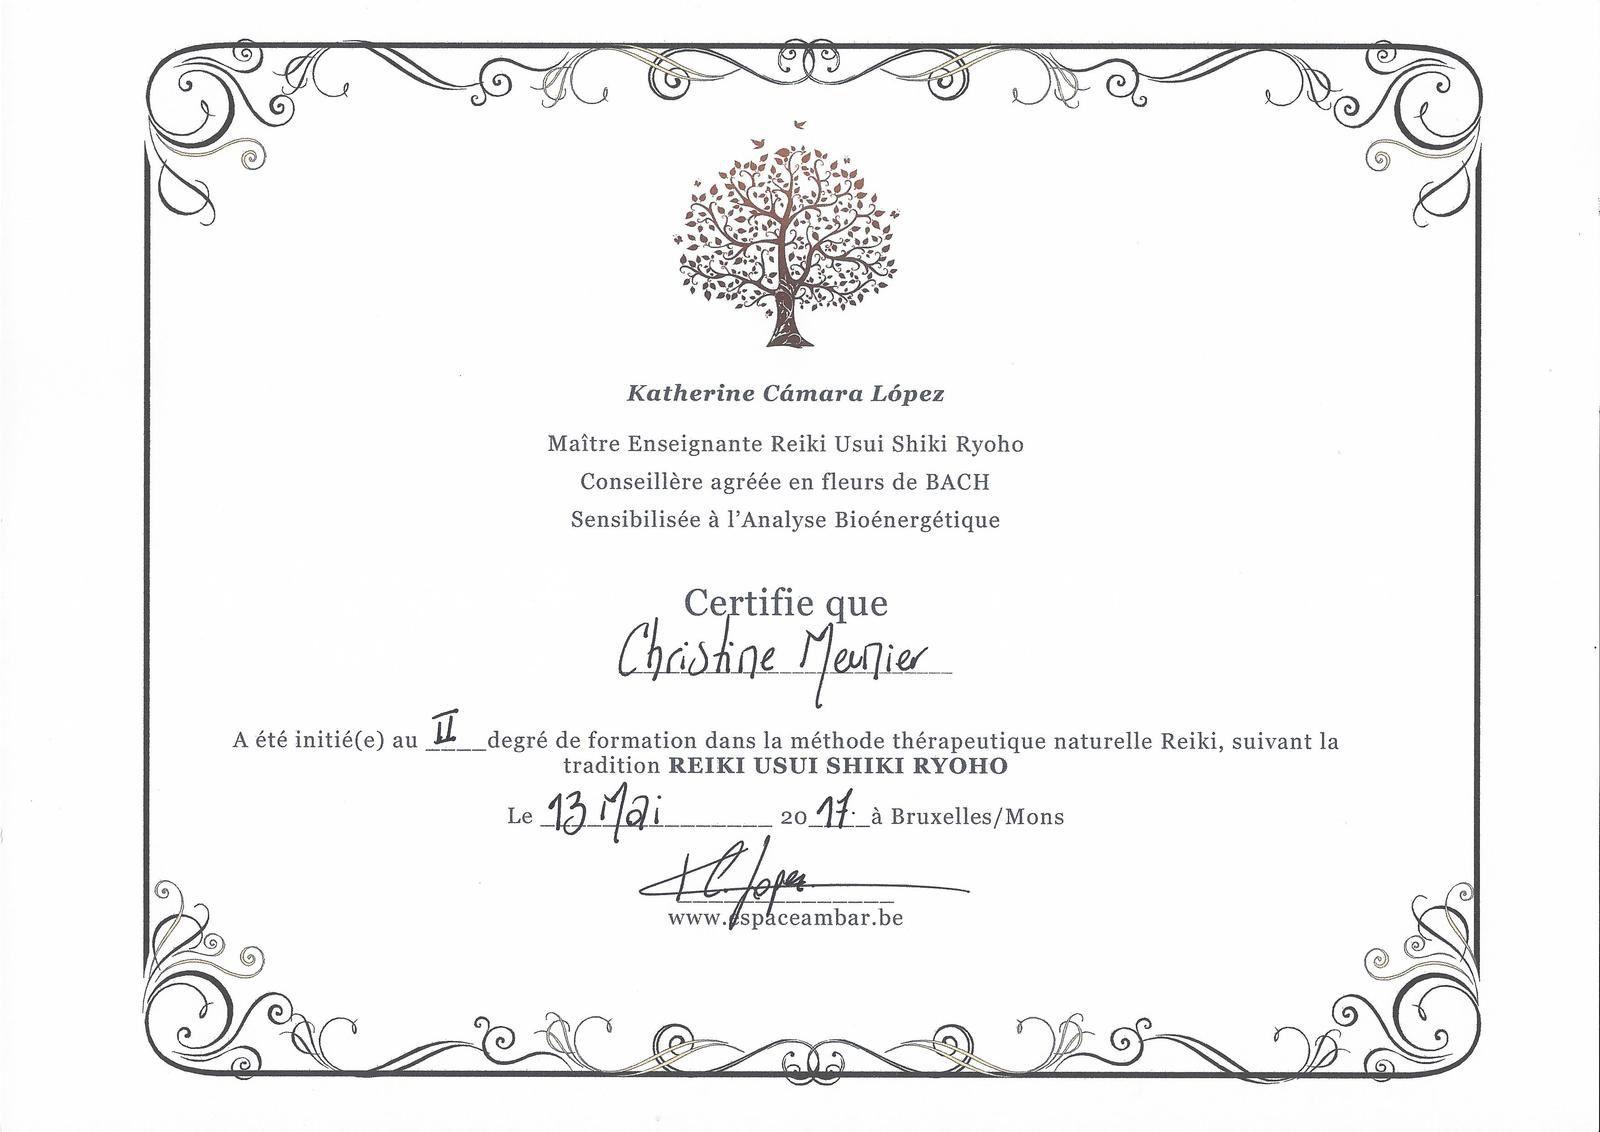 72 - Certification Reiki Usui Shiki Ryoho